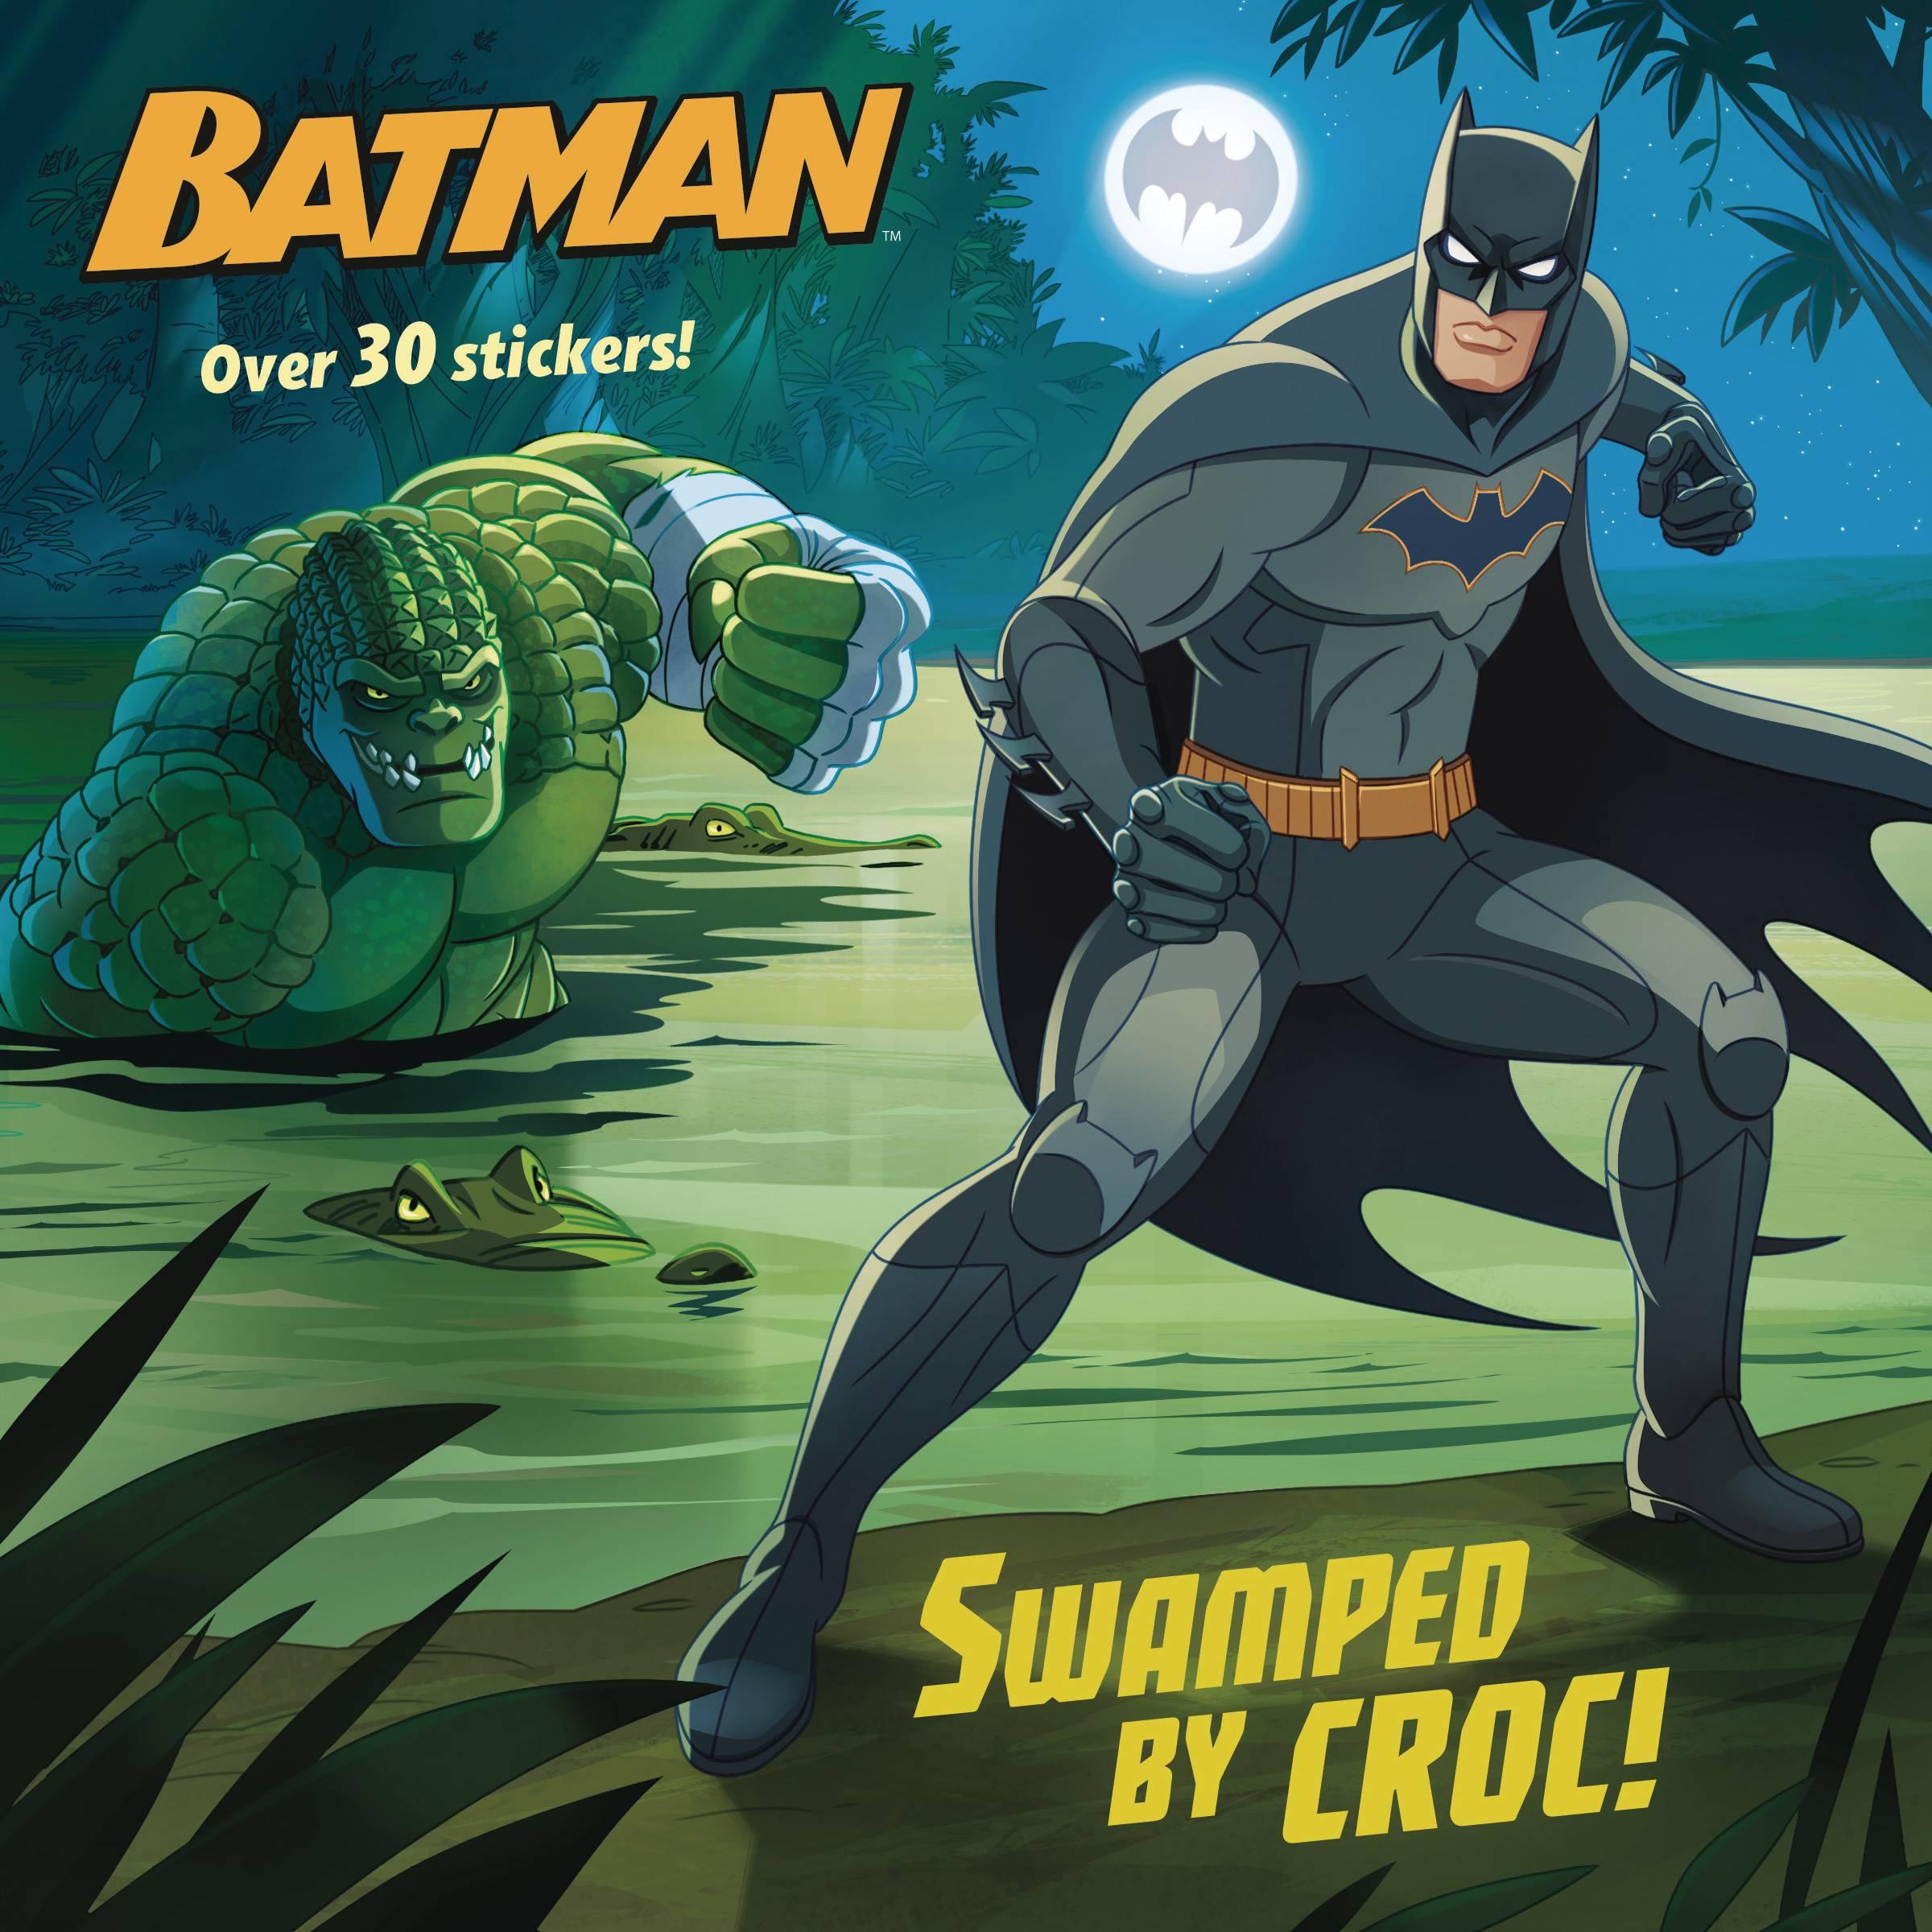 DC SUPER HEROES BATMAN SWAMPED BY CROC PICTUREBACK